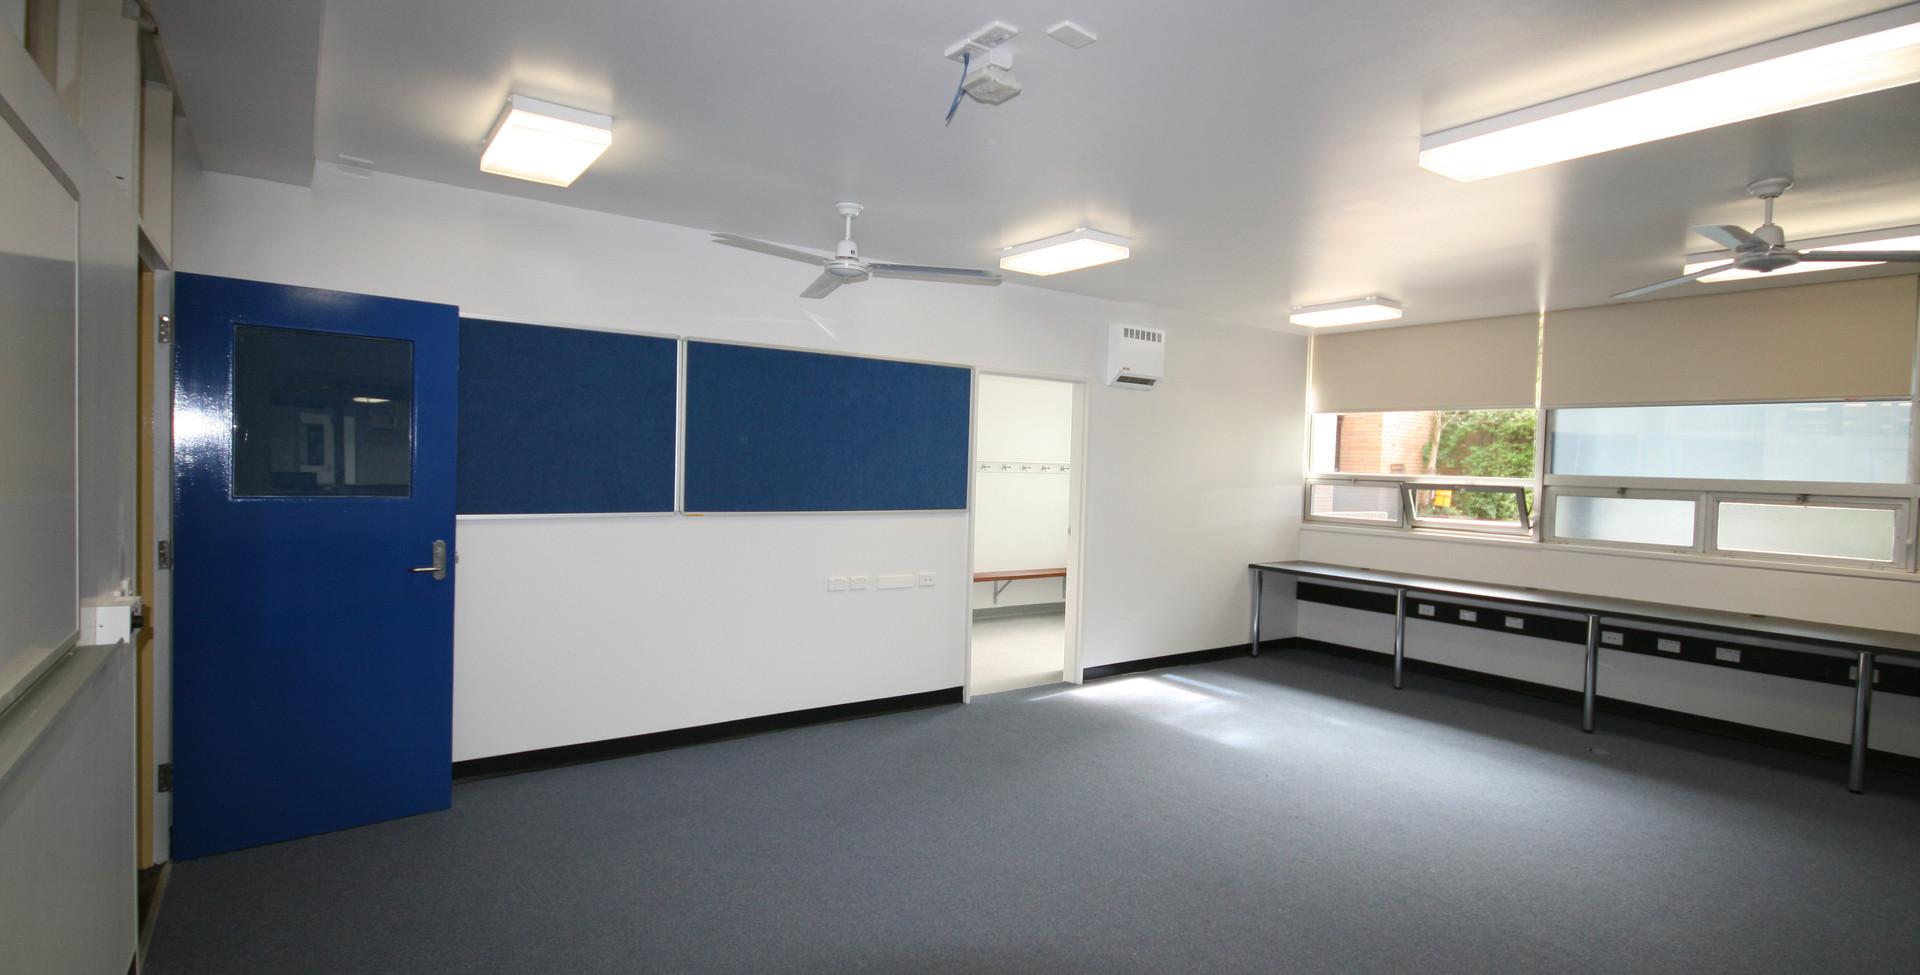 FAIRVALE HIGH SCHOOL - ORIGNAL